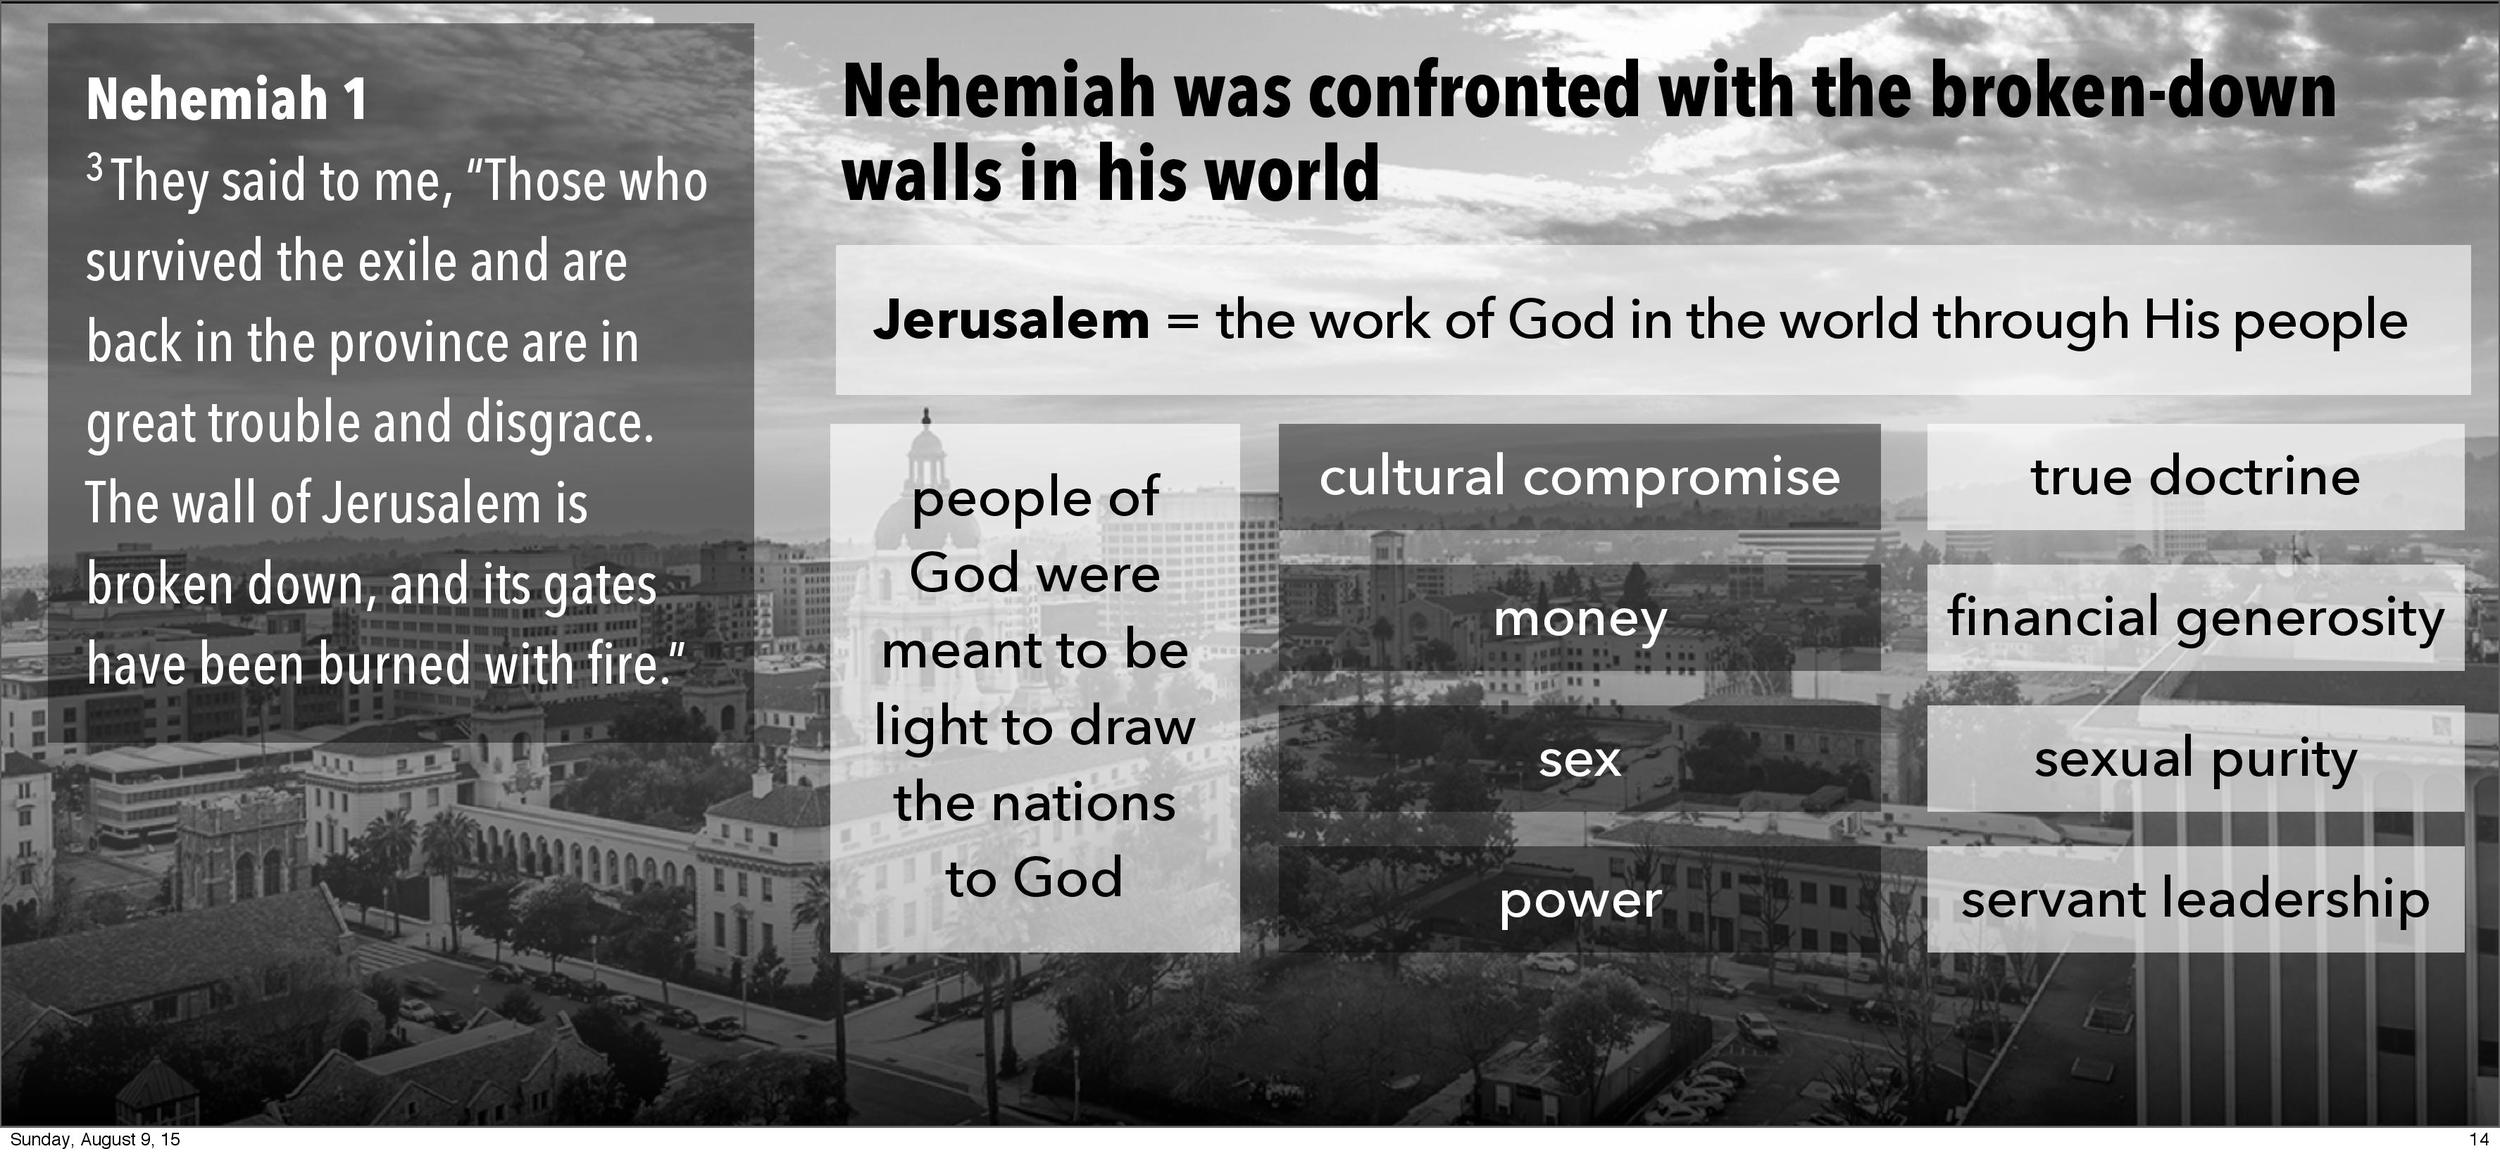 8.9.2015  |  Nehemiah  |  Soul of a Builder-page-006.jpg